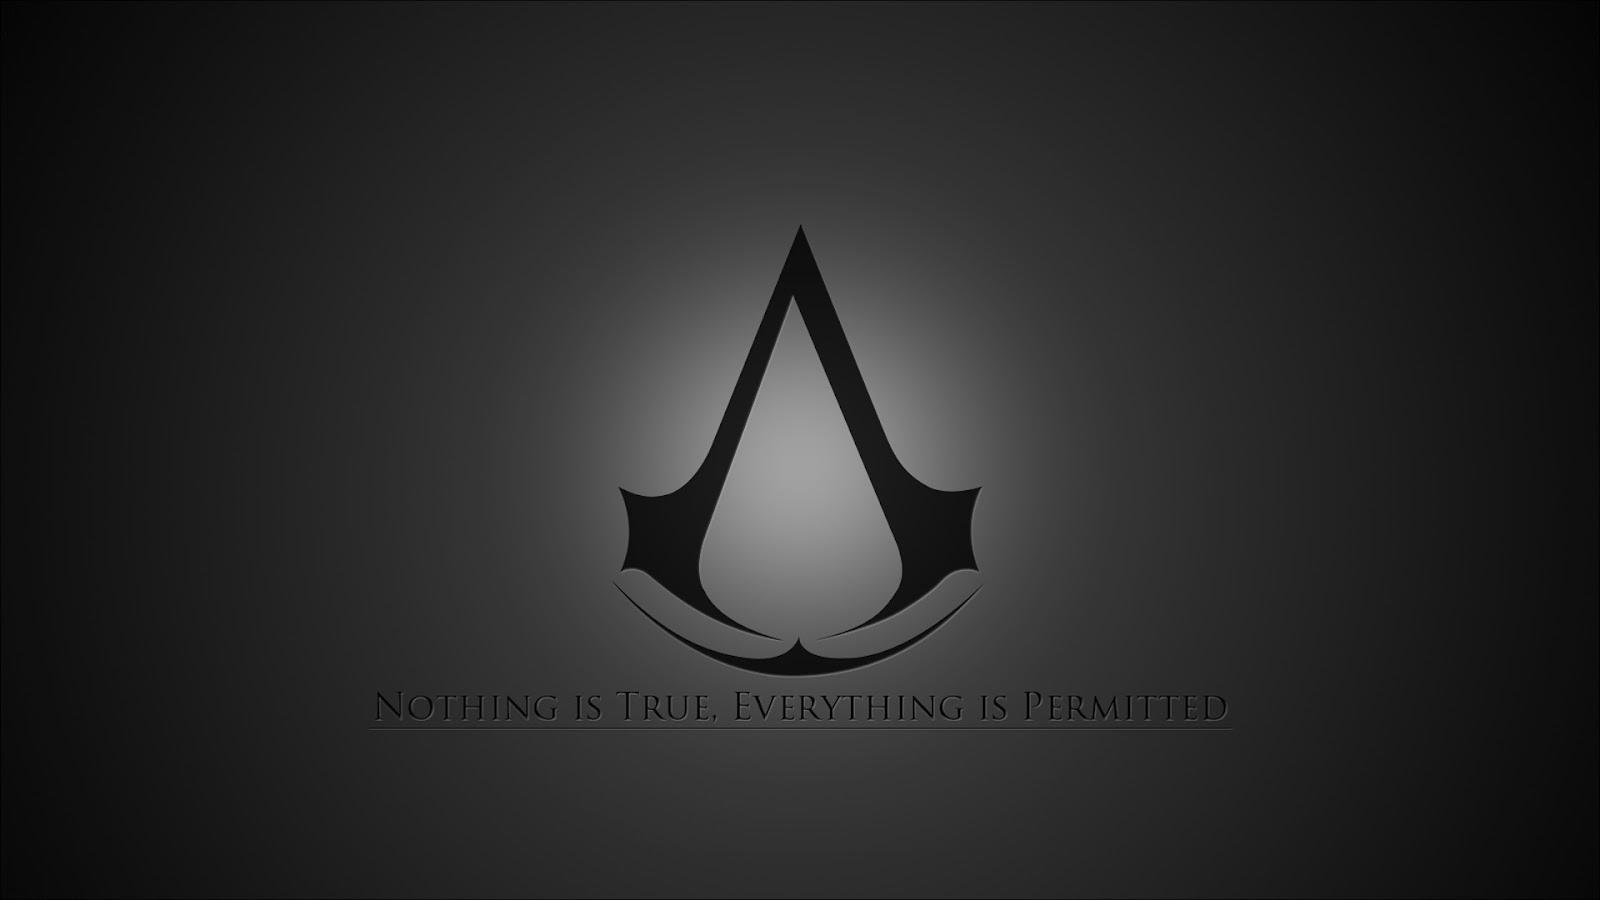 http://1.bp.blogspot.com/-_pTQDTzcnaE/UAOO-je5koI/AAAAAAAABBo/VdelNlqa6sI/s1600/assassins+creed+ac+brotherhood+logo+trademark+symbol+wallpaper+background+ubisoft+action.jpg